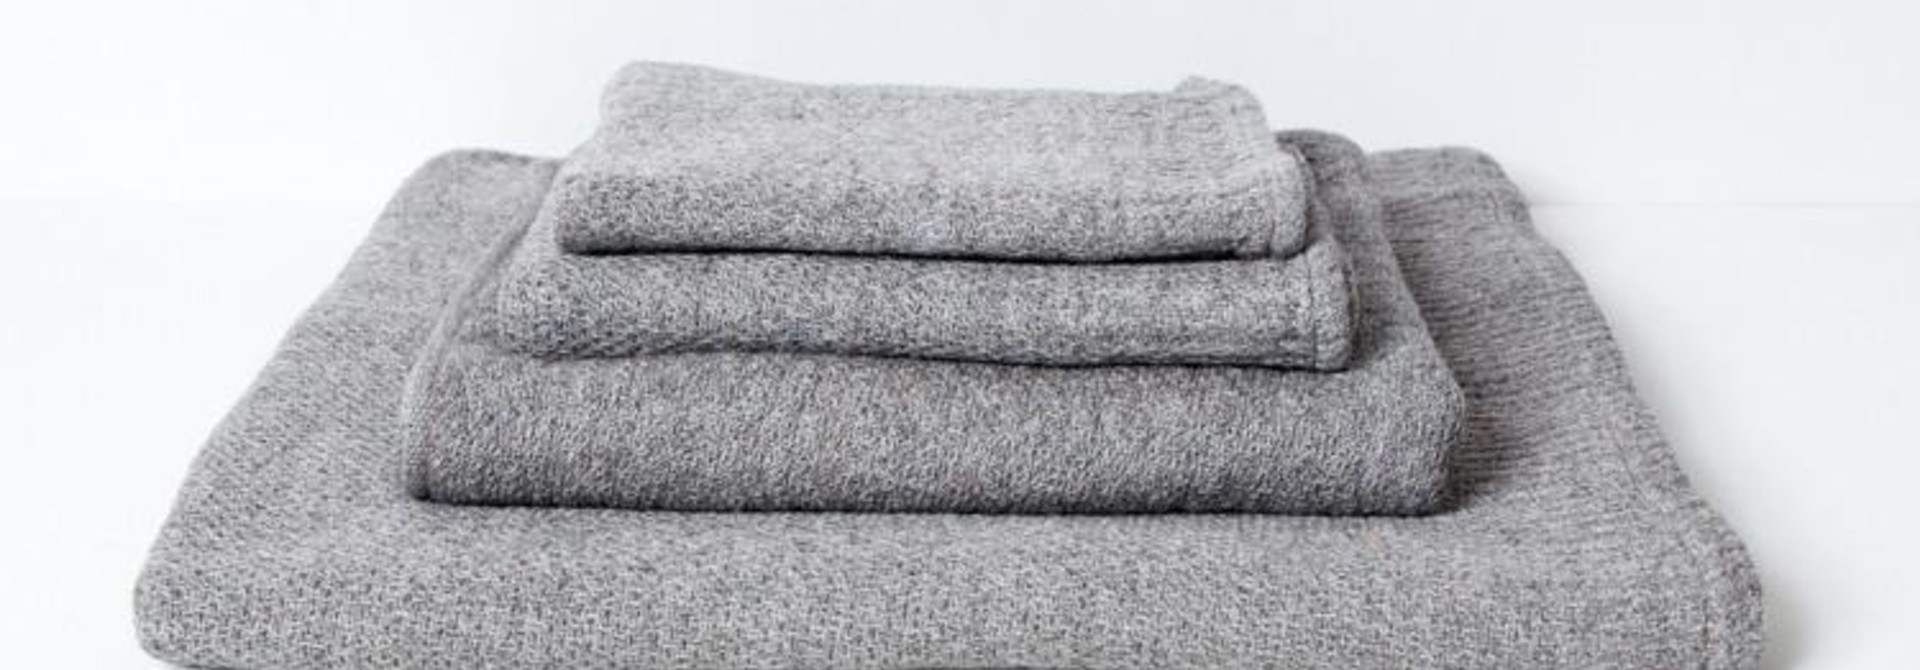 Bath Towel  - Lana - Grey